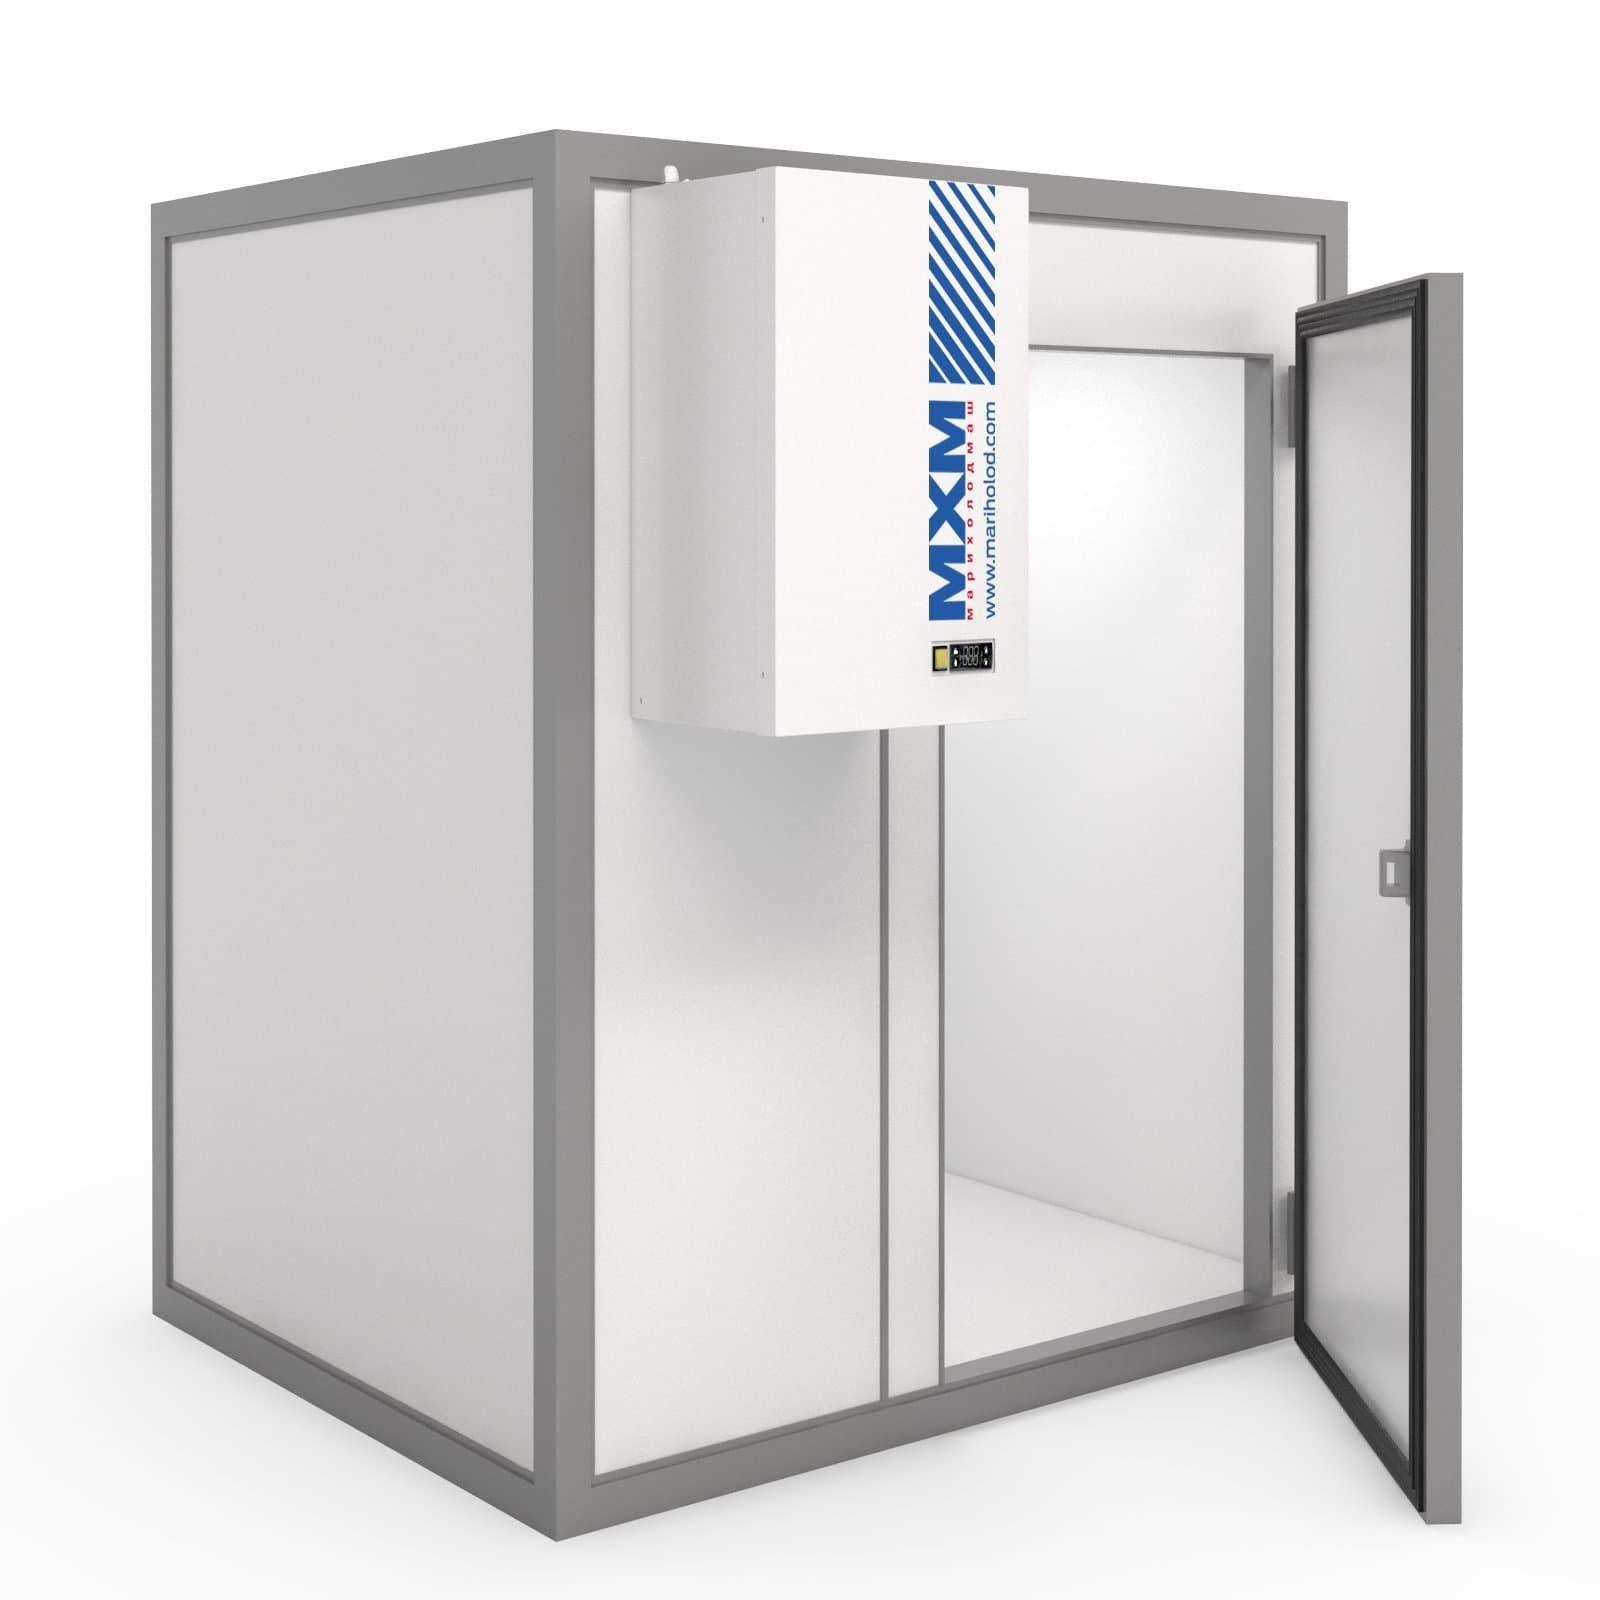 Камера холодильная МХМ КХН-19,87 1360×7360×2460